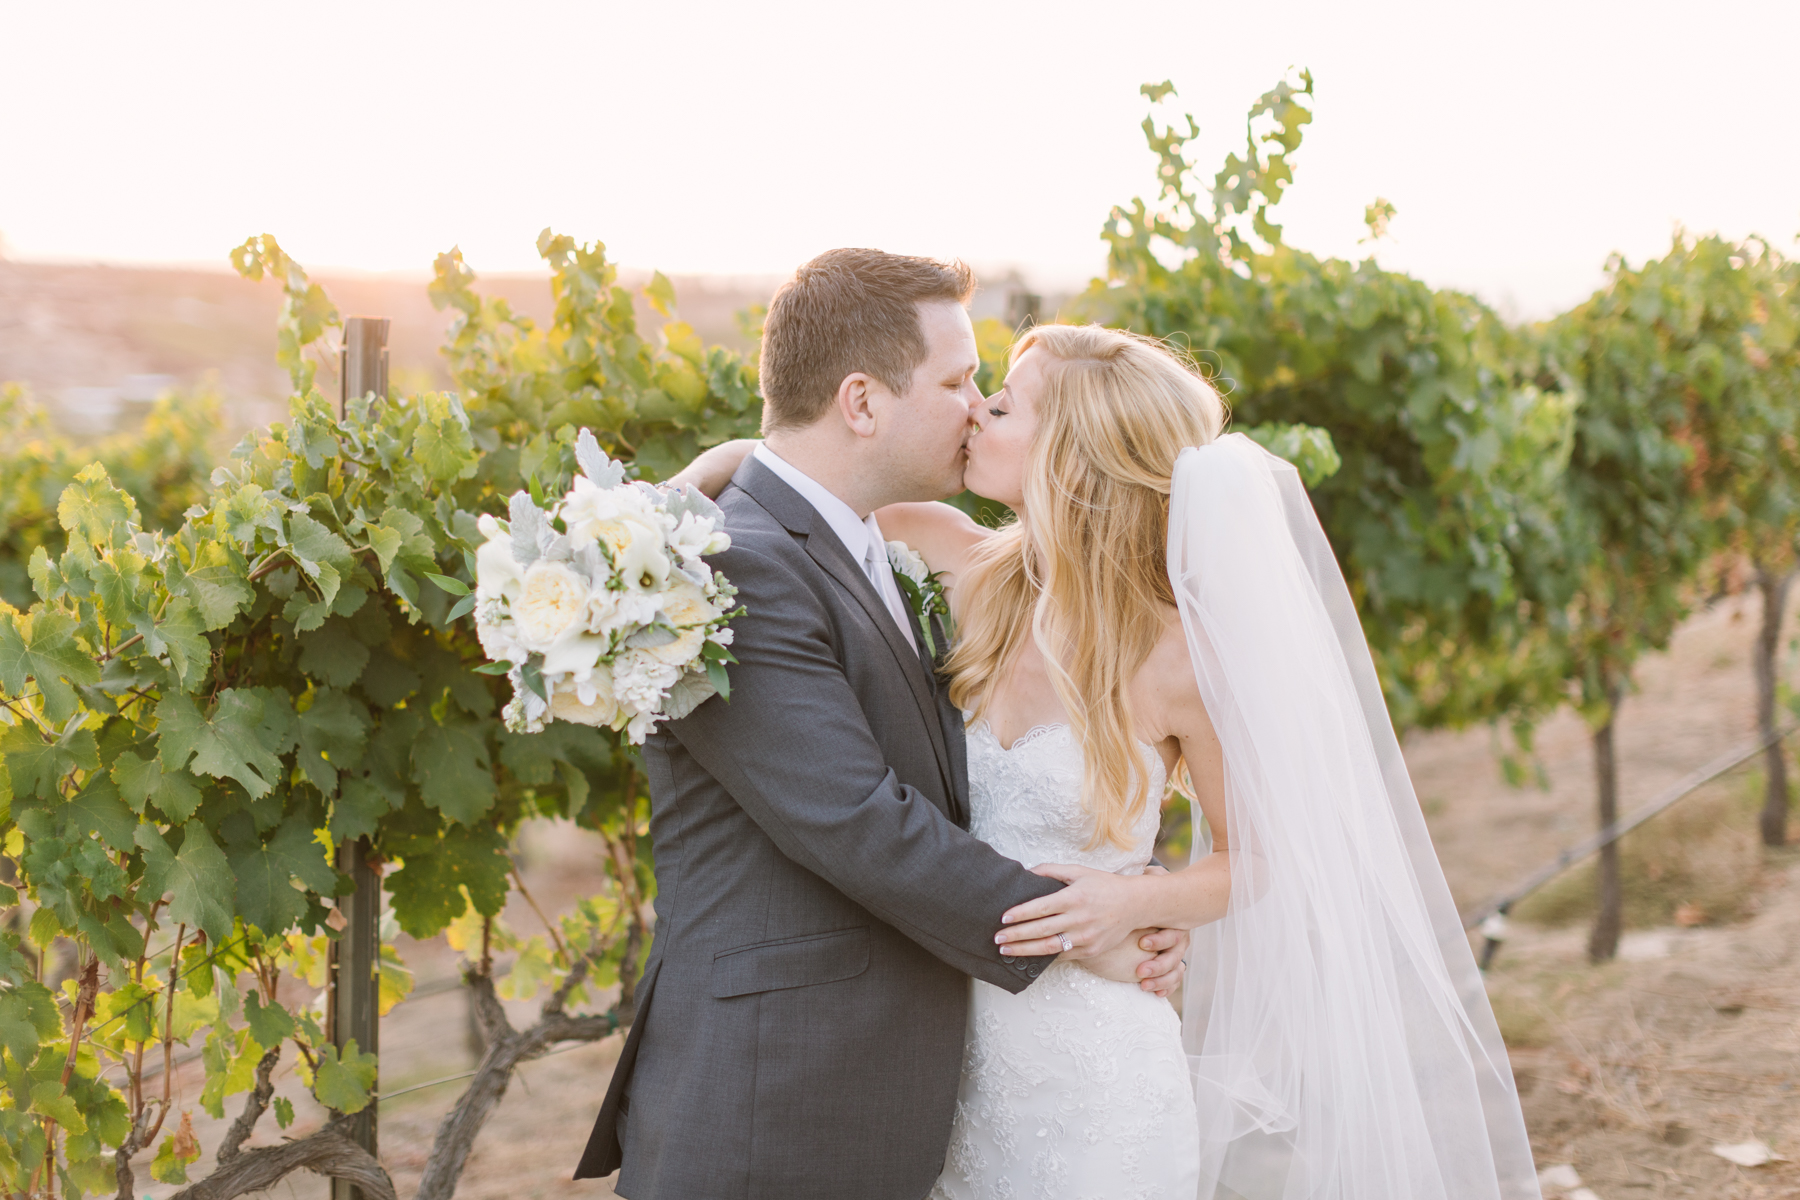 Orange-County-Wedding-Photography-Brianna-Caster-and-Co-Photographers-Falkner-Winery-Wedding-4